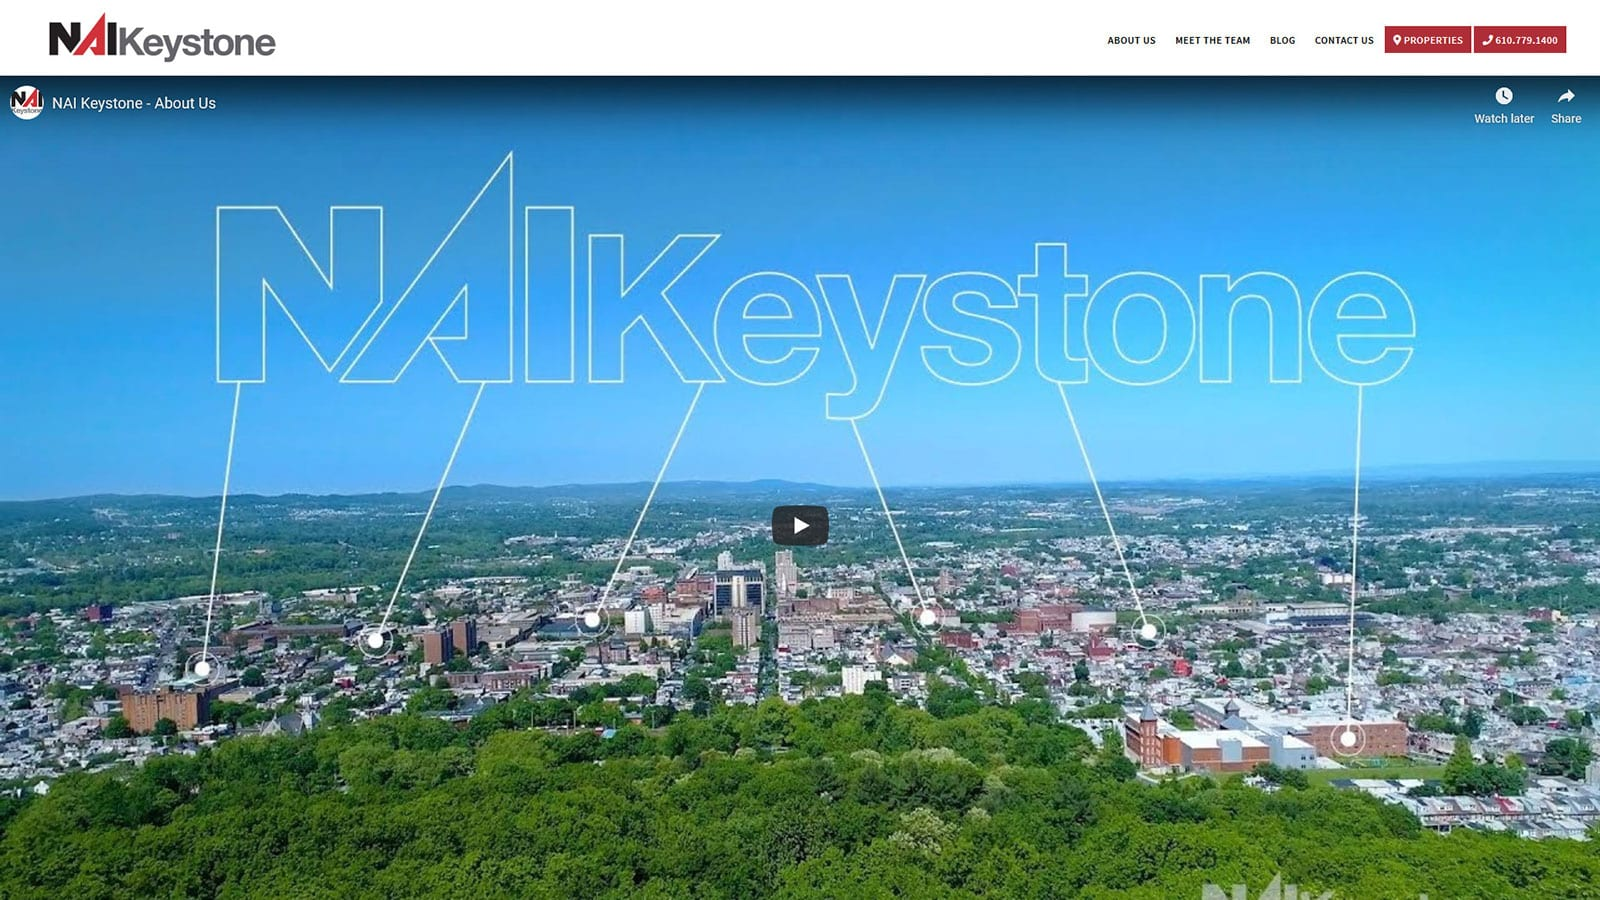 Website Redesign of NAI Keystone of Wyomissing, PA 19611